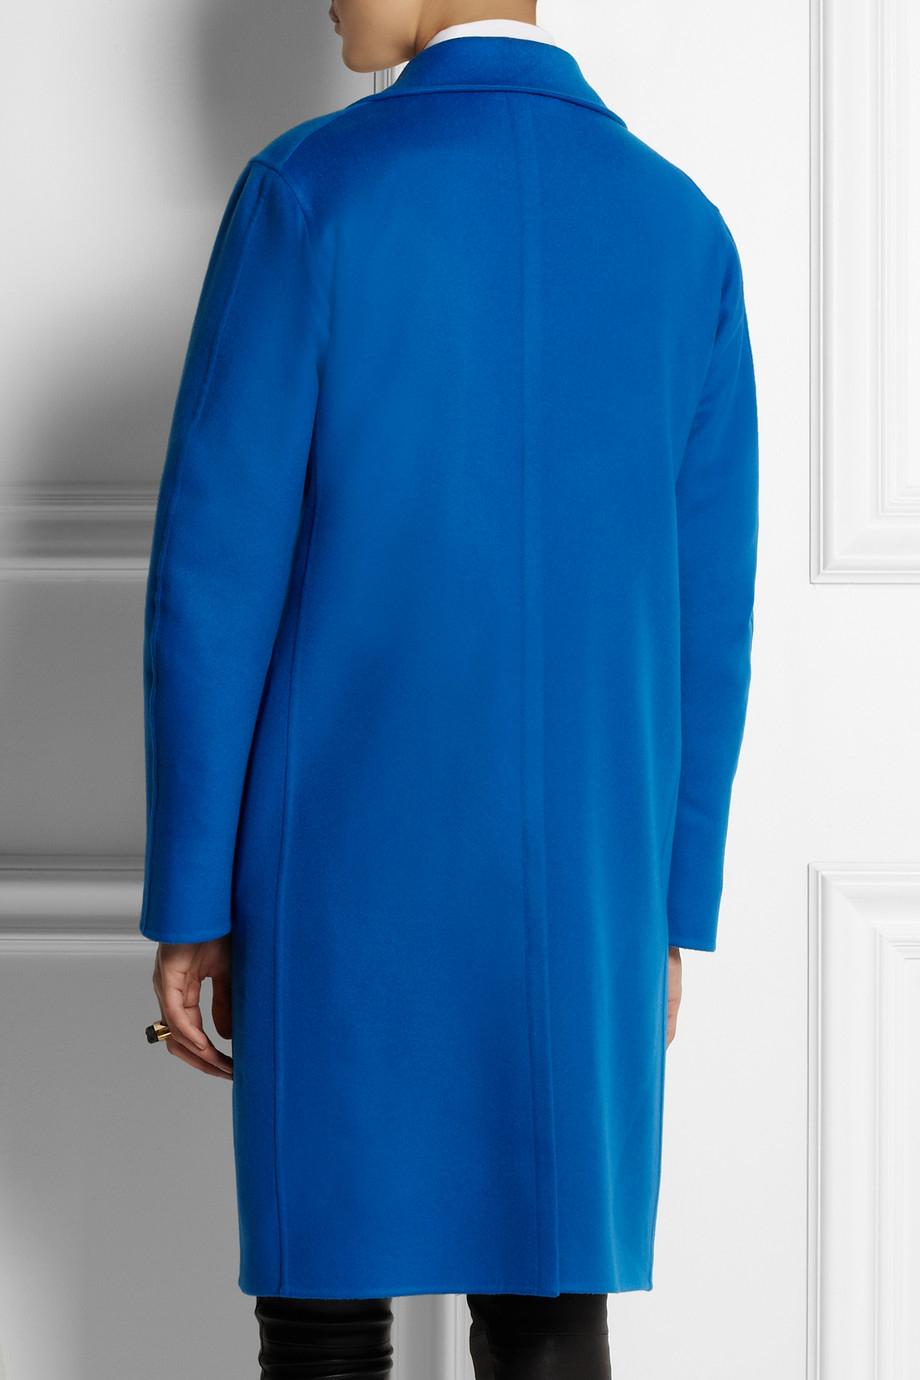 Jil sander Riverton Cashmere Coat in Blue | Lyst